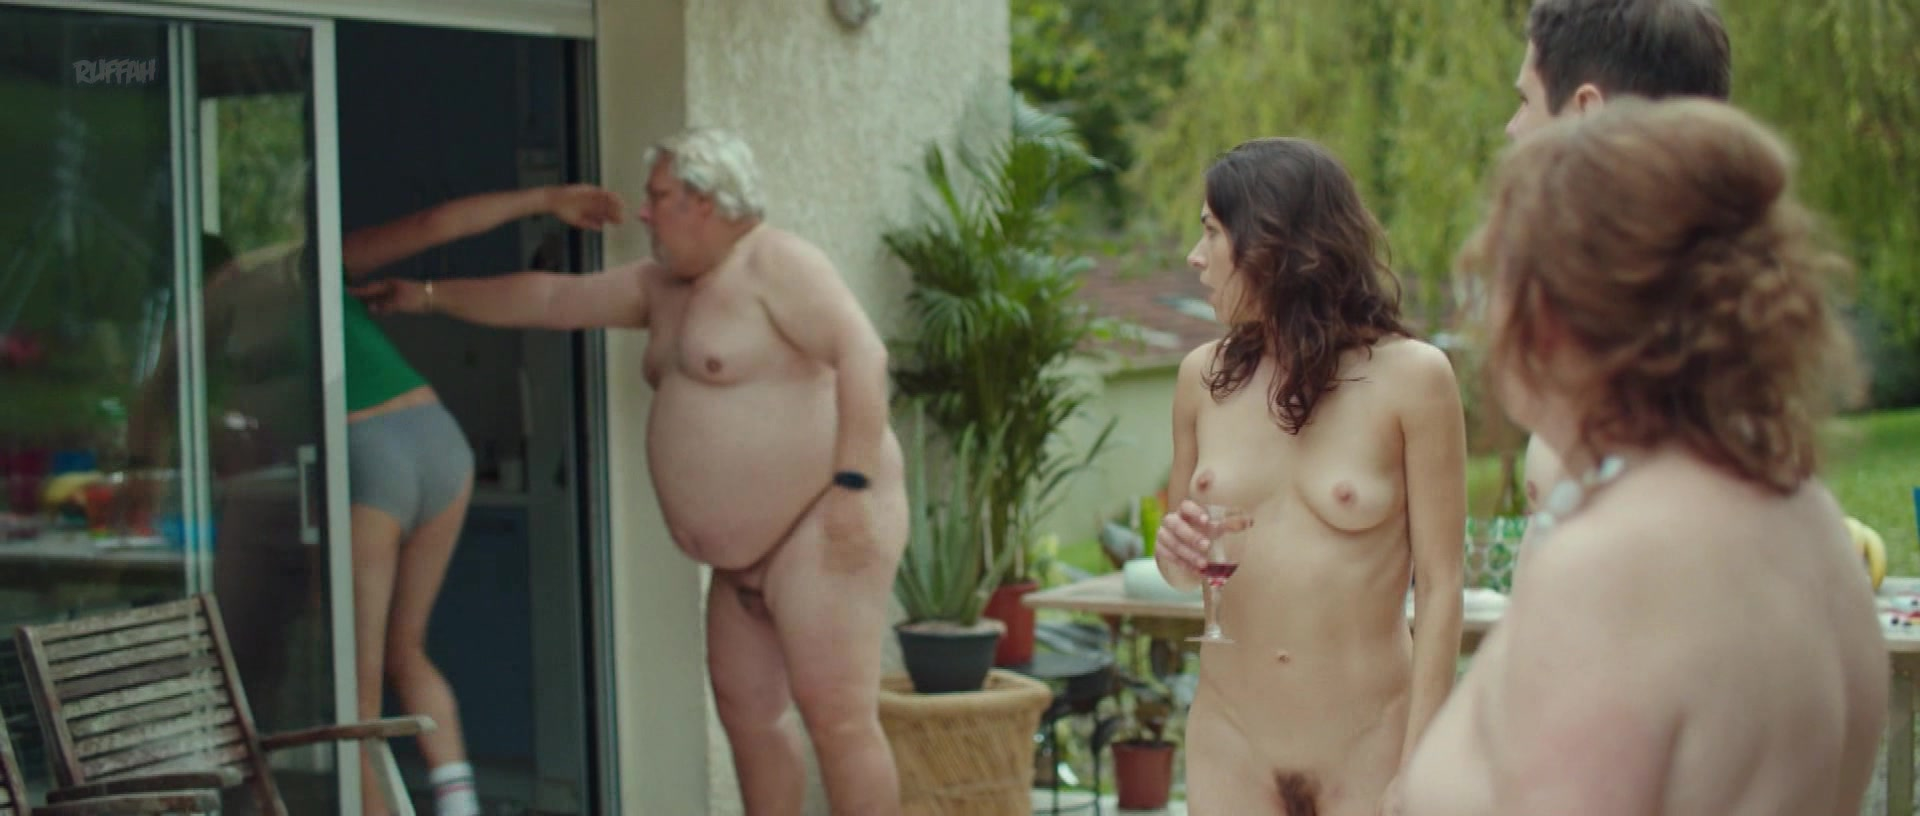 Nackt  Valerie Decobert MrSkin